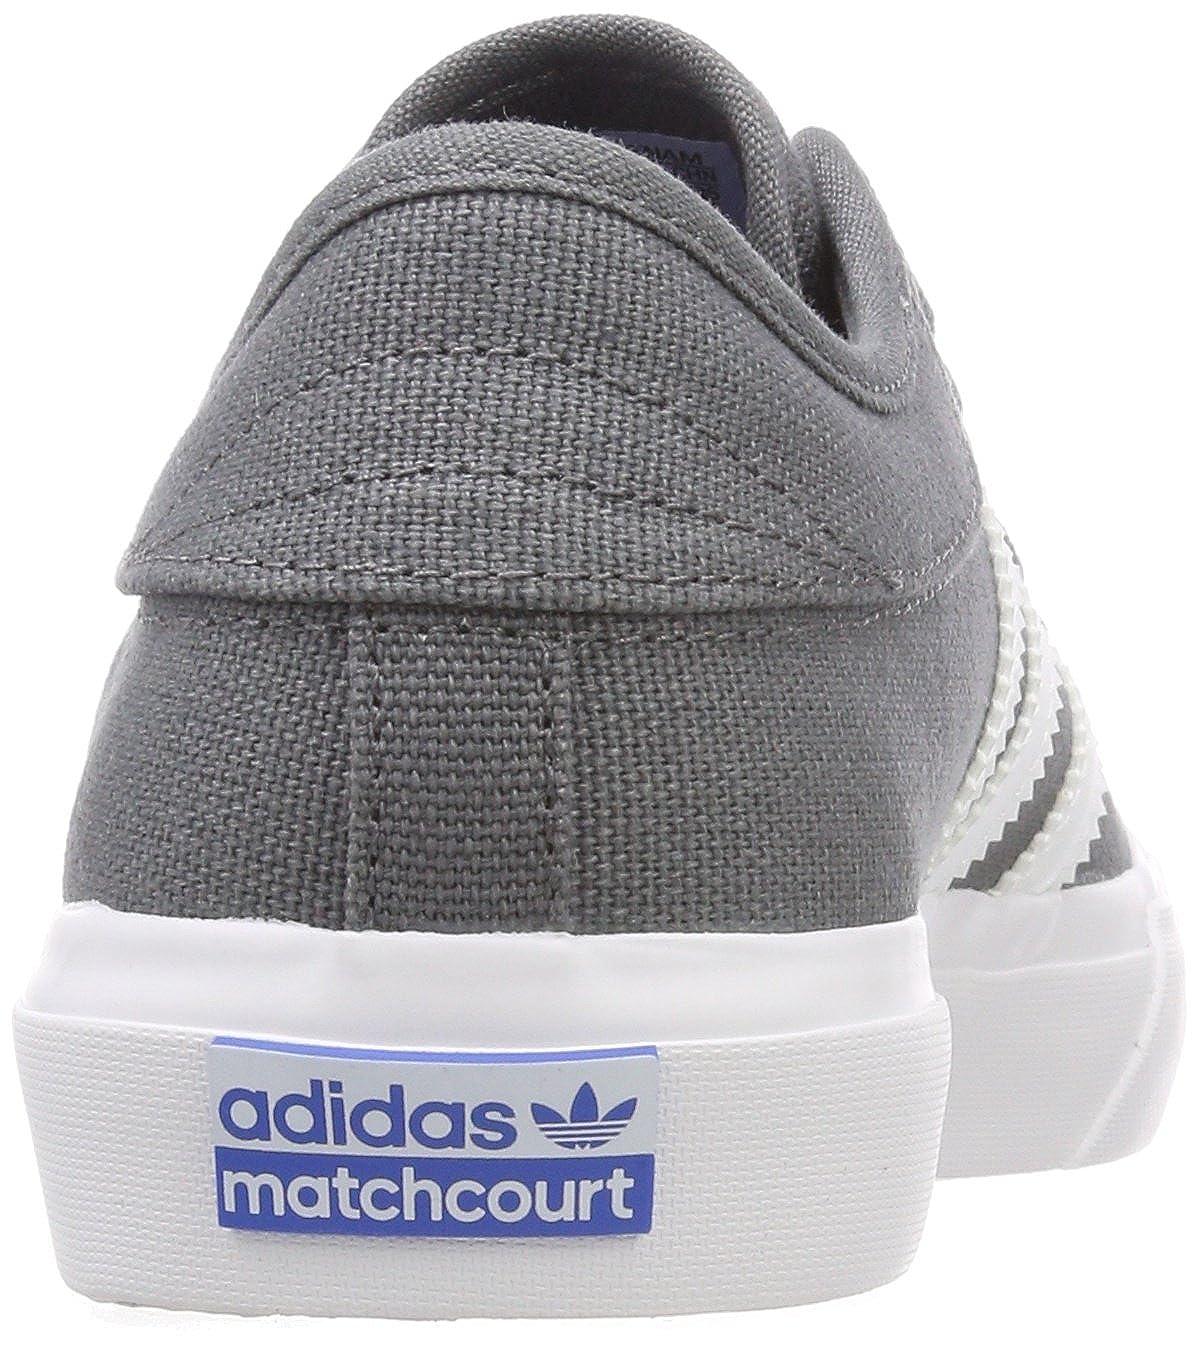 outlet store 4145b 6555a adidas Matchcourt J, Scarpe da Skateboard Unisex - Bambini  Amazon.it   Scarpe e borse